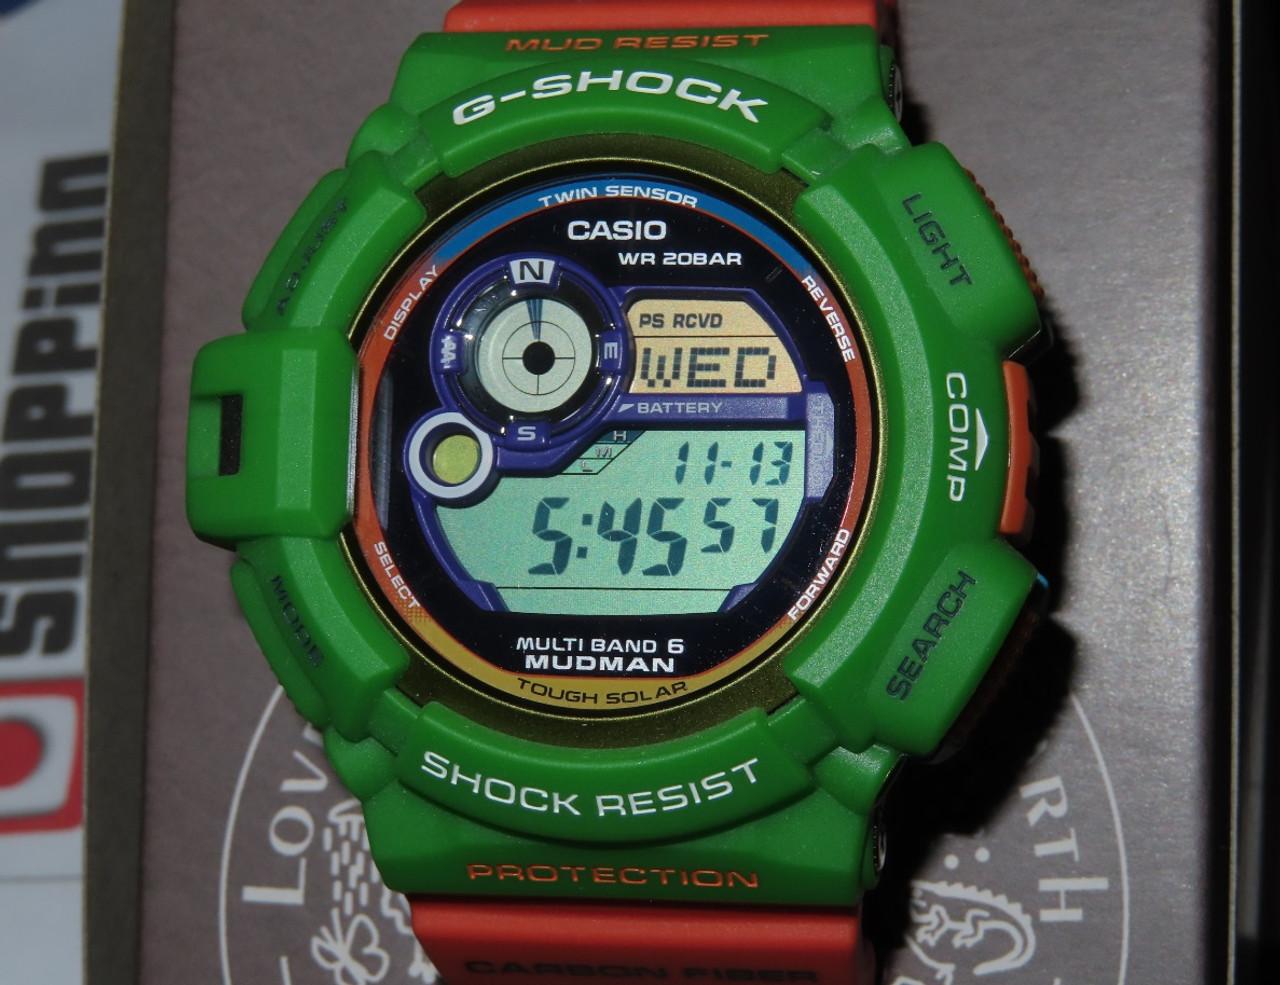 Casio Mudman GW-9300K-3JR Love The Sea And The Earth